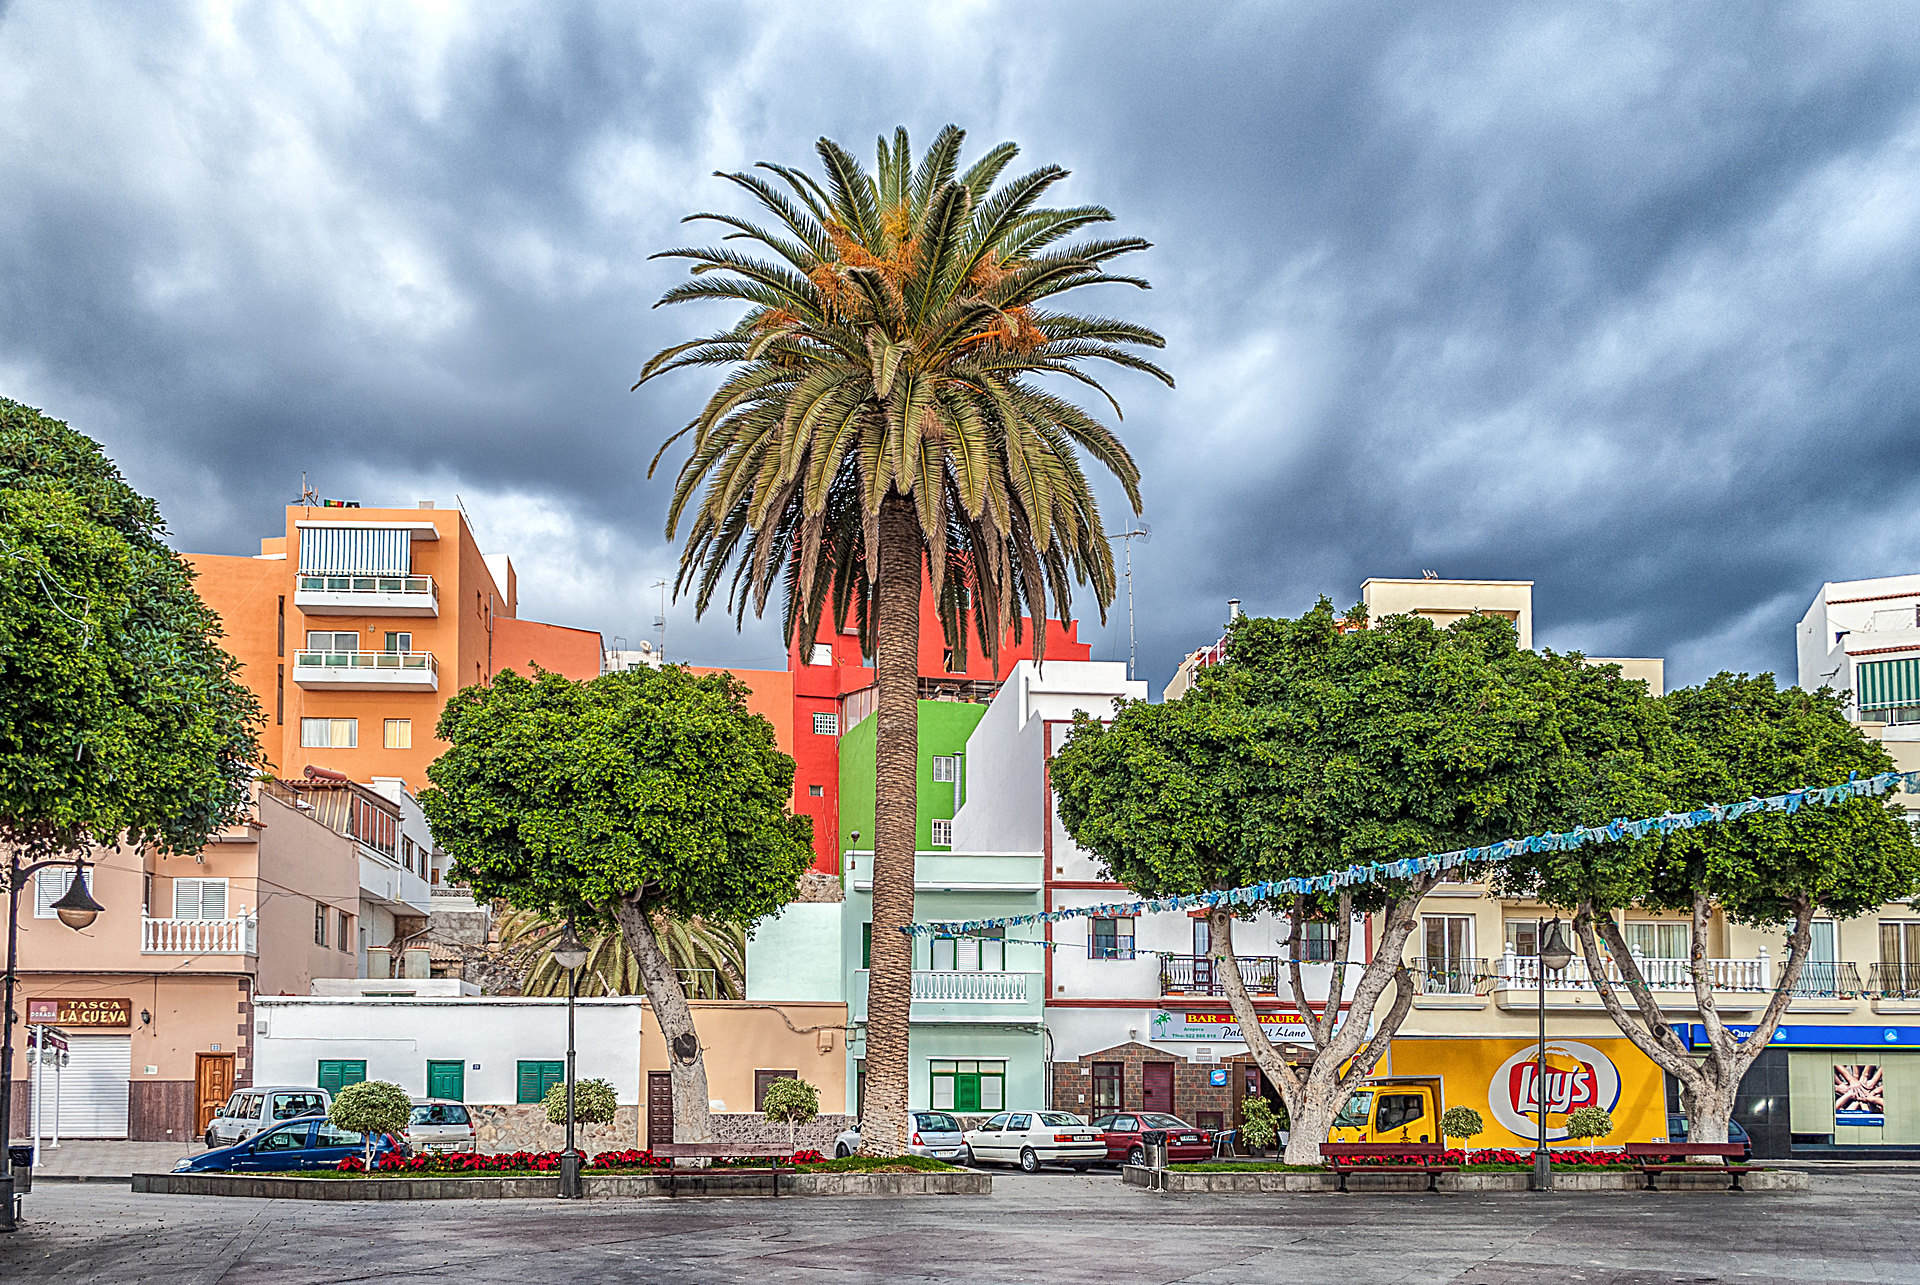 Plaza-Llano-Alcala